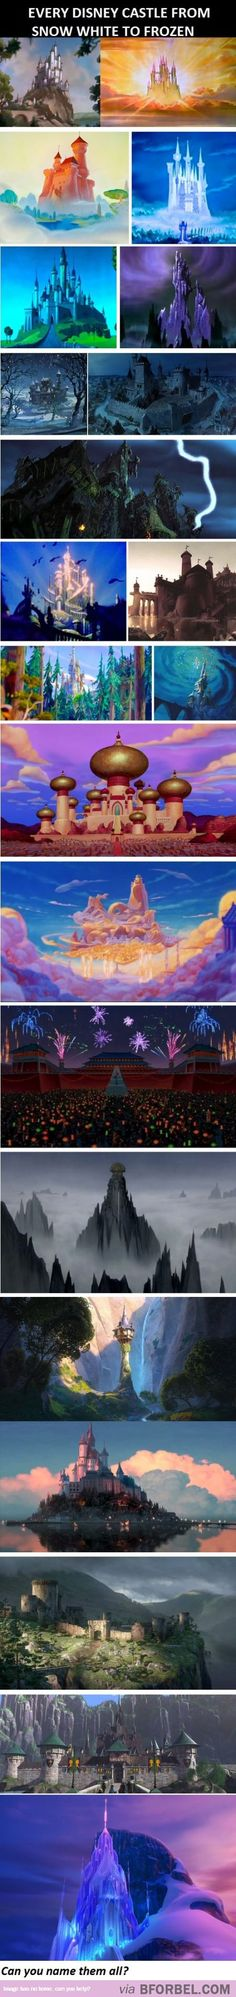 22 Disney Castles Across Time - Snow White, IDK, Fantasia, Cinderella, IDK, IDK, The Sword in the Stone, Robin Hood, The Black Cauldron? The Little Mermaid, The Little Mermaid, Beauty and the Beast, Fantasia 2000?, Aladin, Hercules, Mulan, The Road to El Dorado?, Rapunzel, Rapunzel, Brave, Frozen and Frozen.